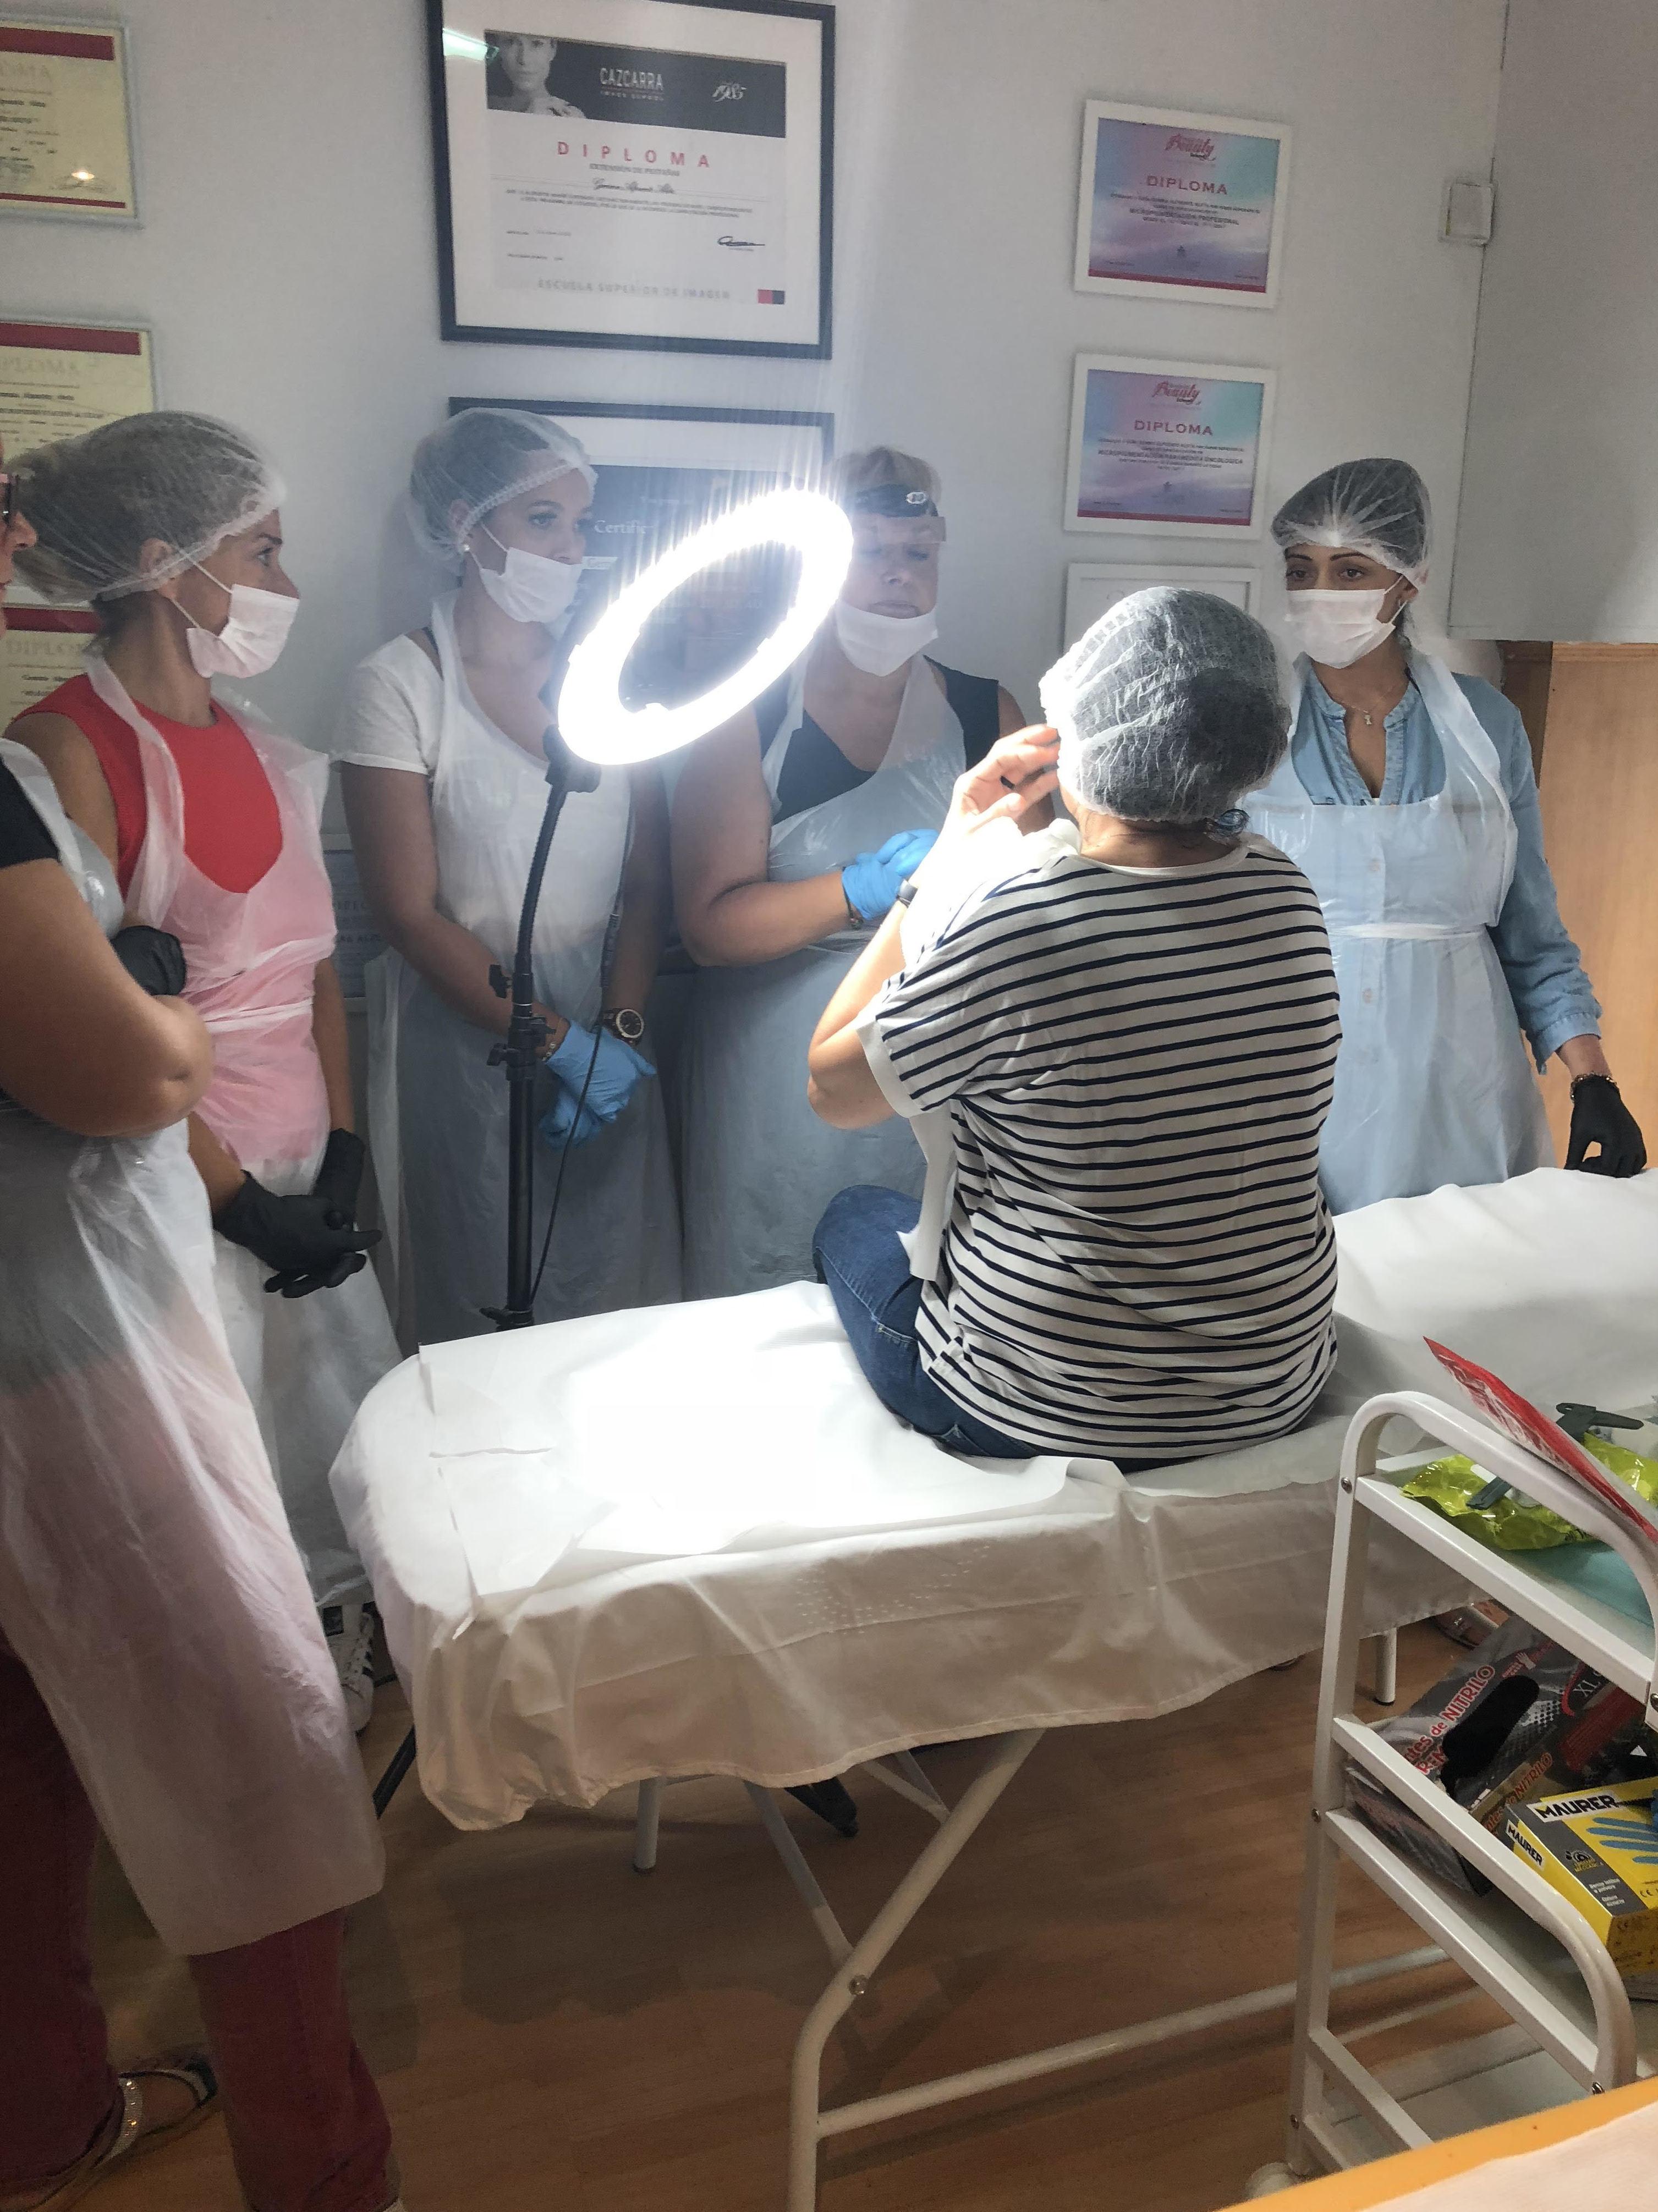 Foto 4 de Centros de estética en Zaragoza | Gemma Beauty Bar